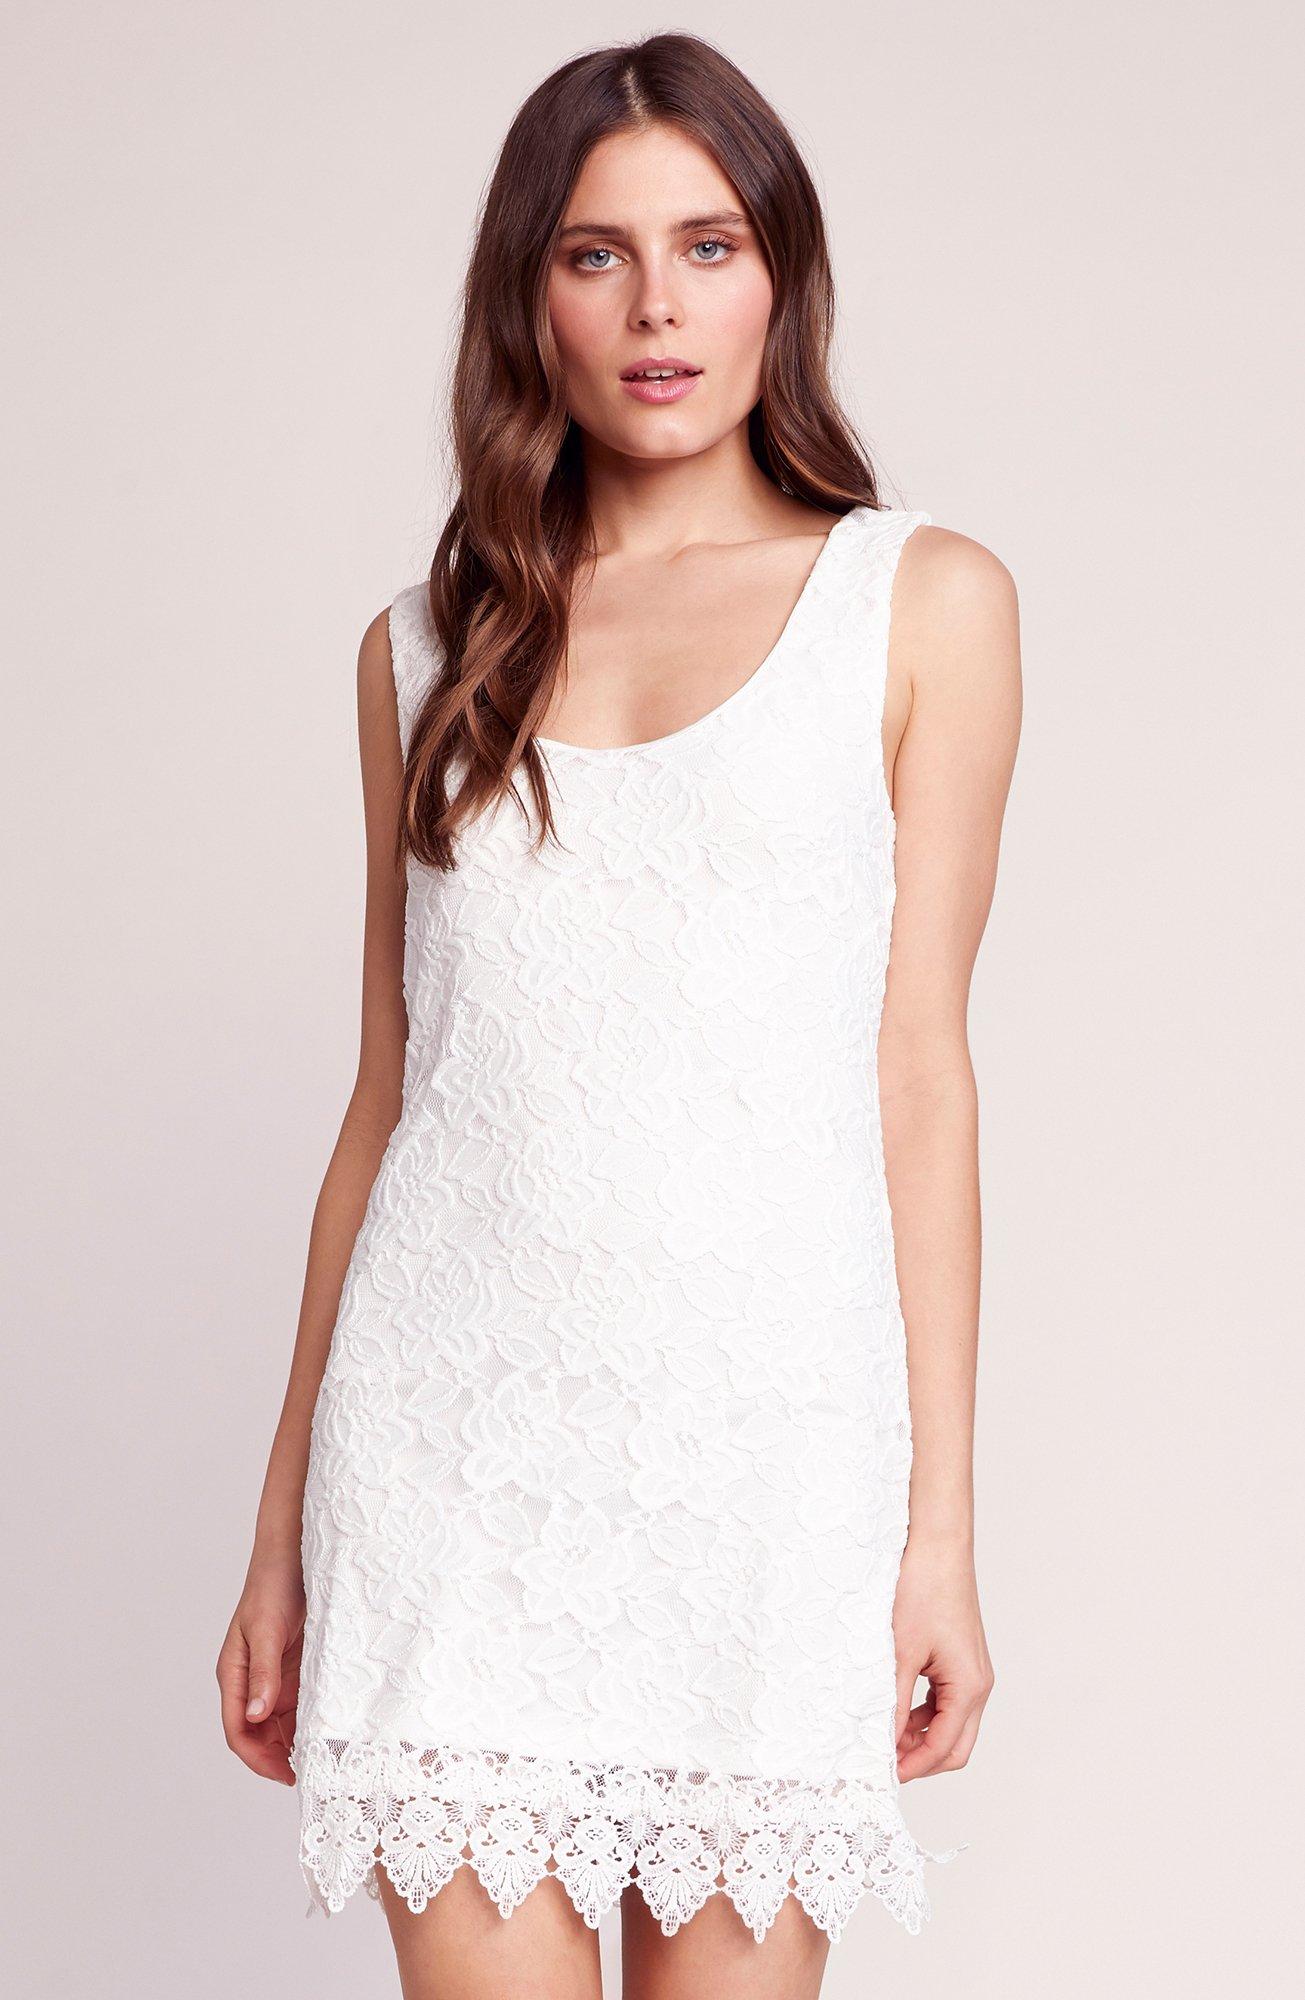 Grow With It Lace Shift Dress Lace Shift Dress Lace White Dress Dresses [ 2000 x 1305 Pixel ]